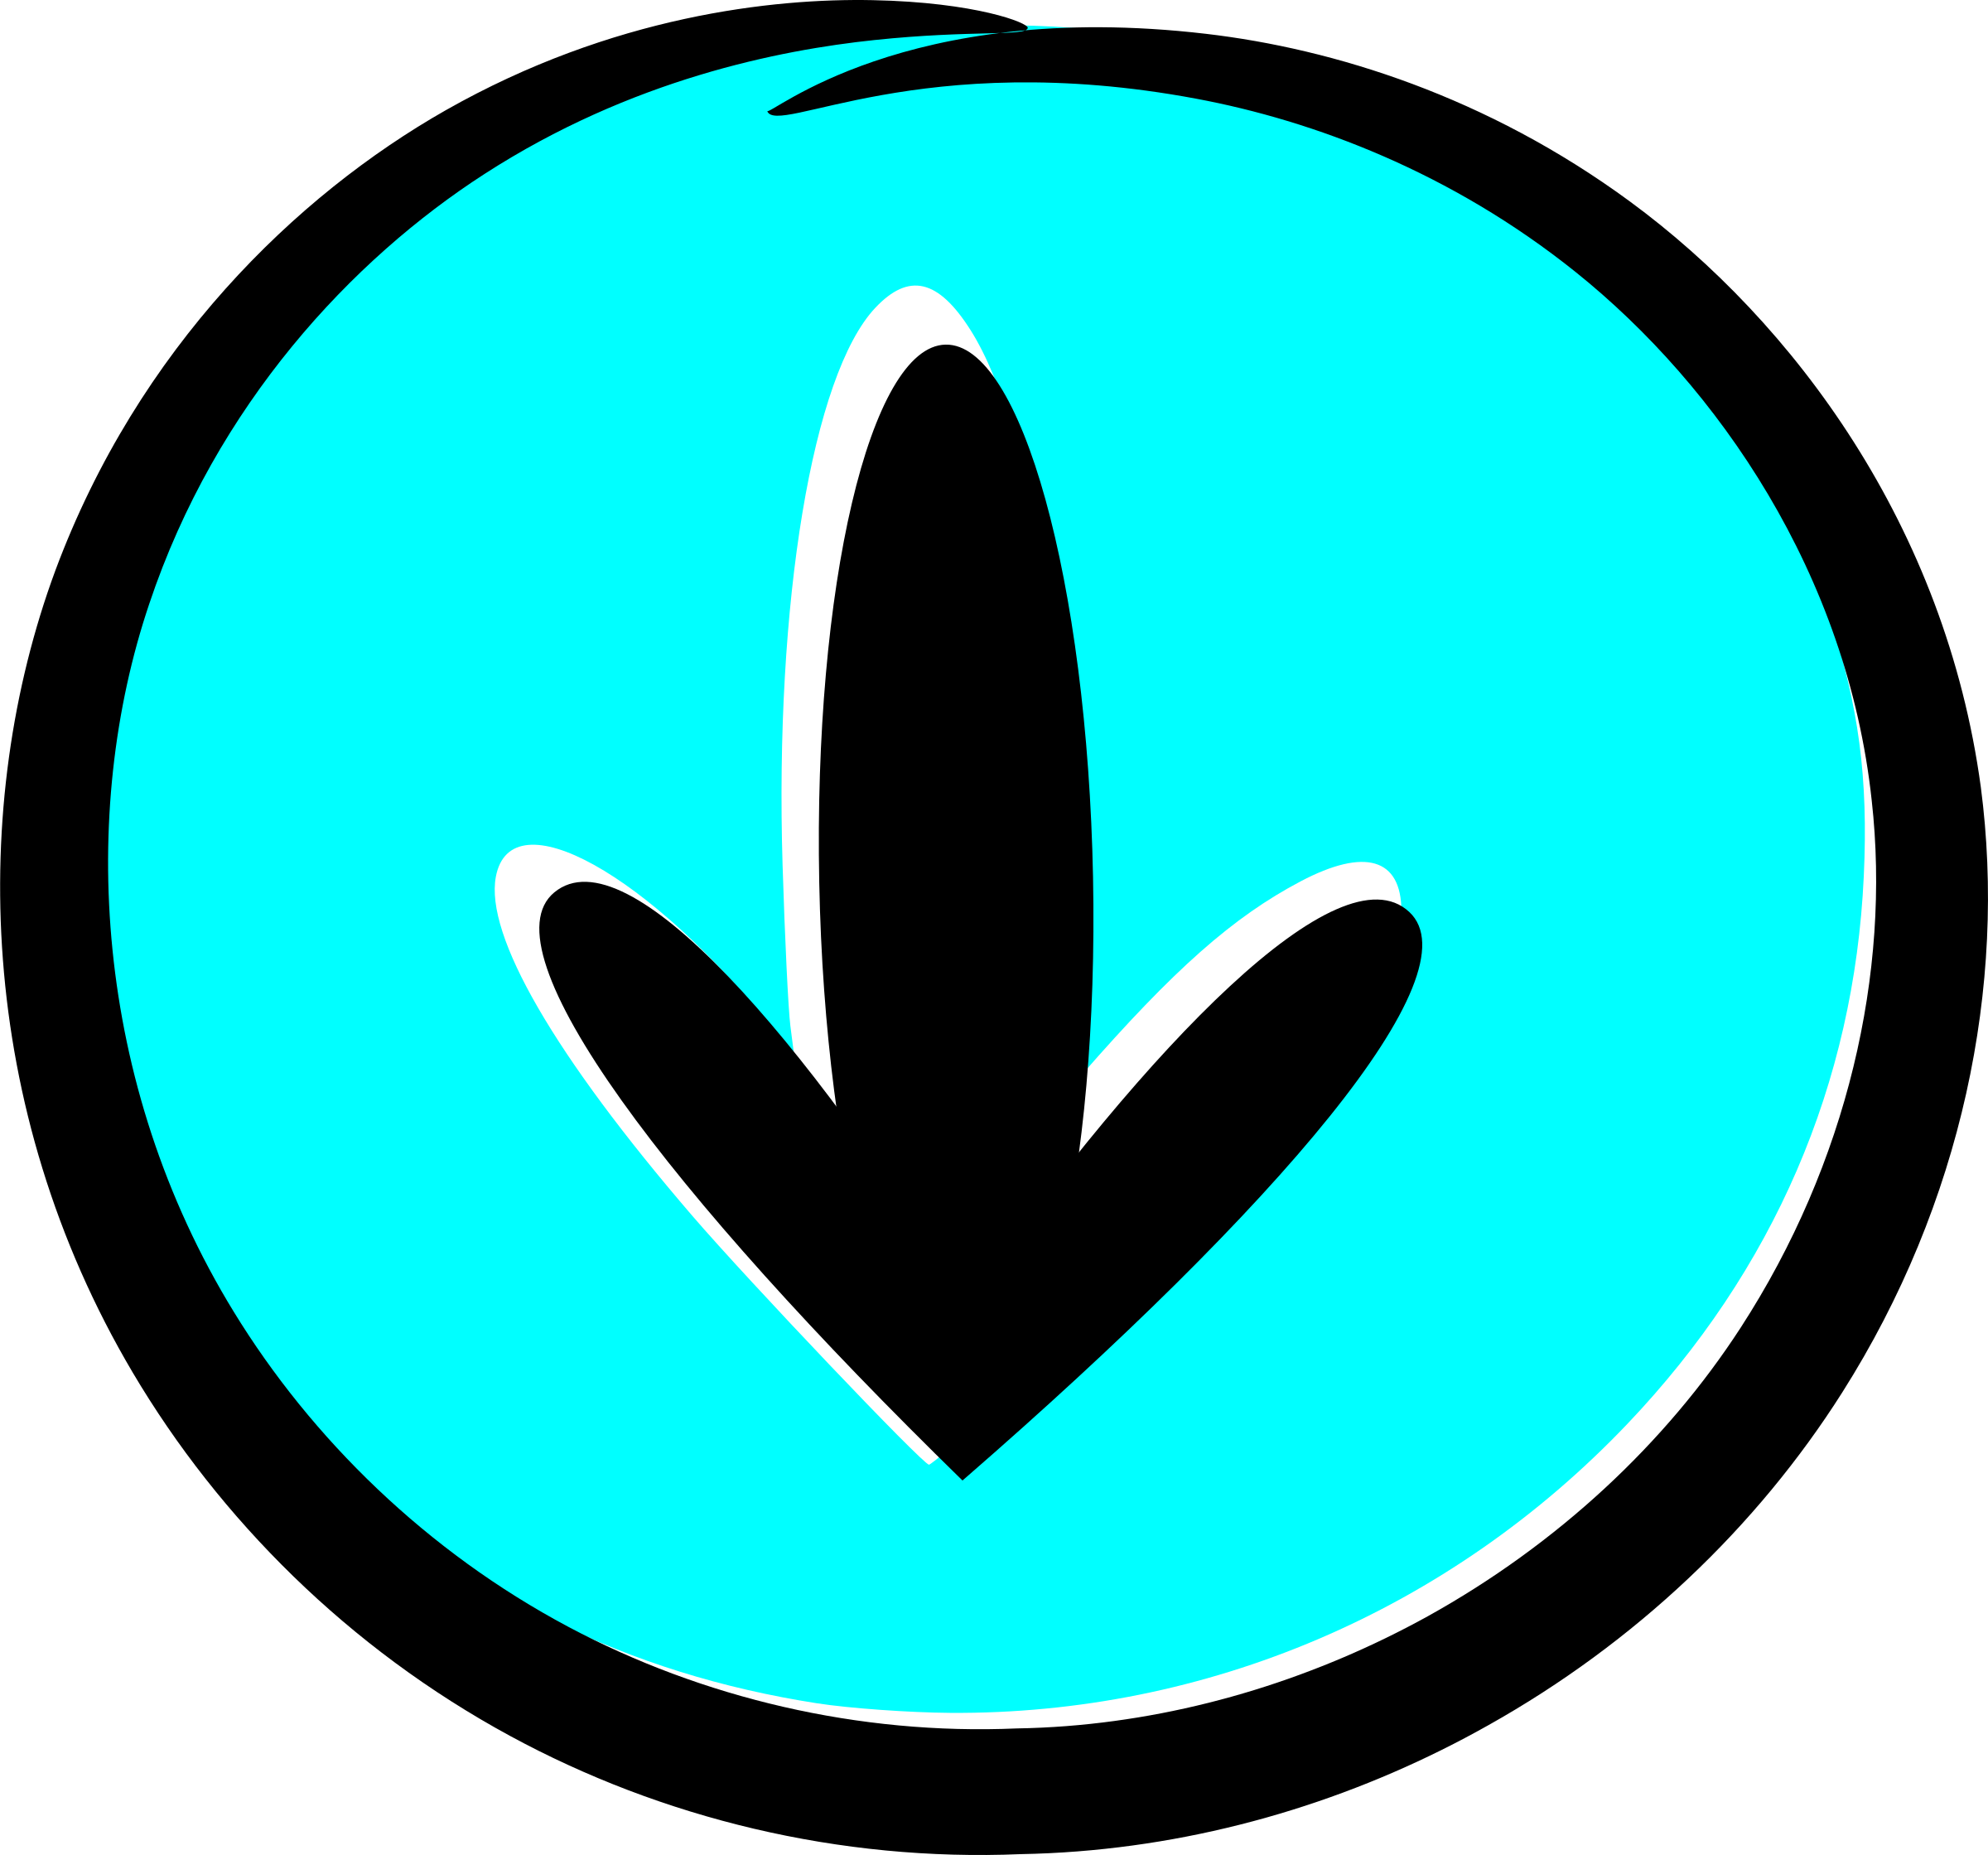 Download Icon Clipart.